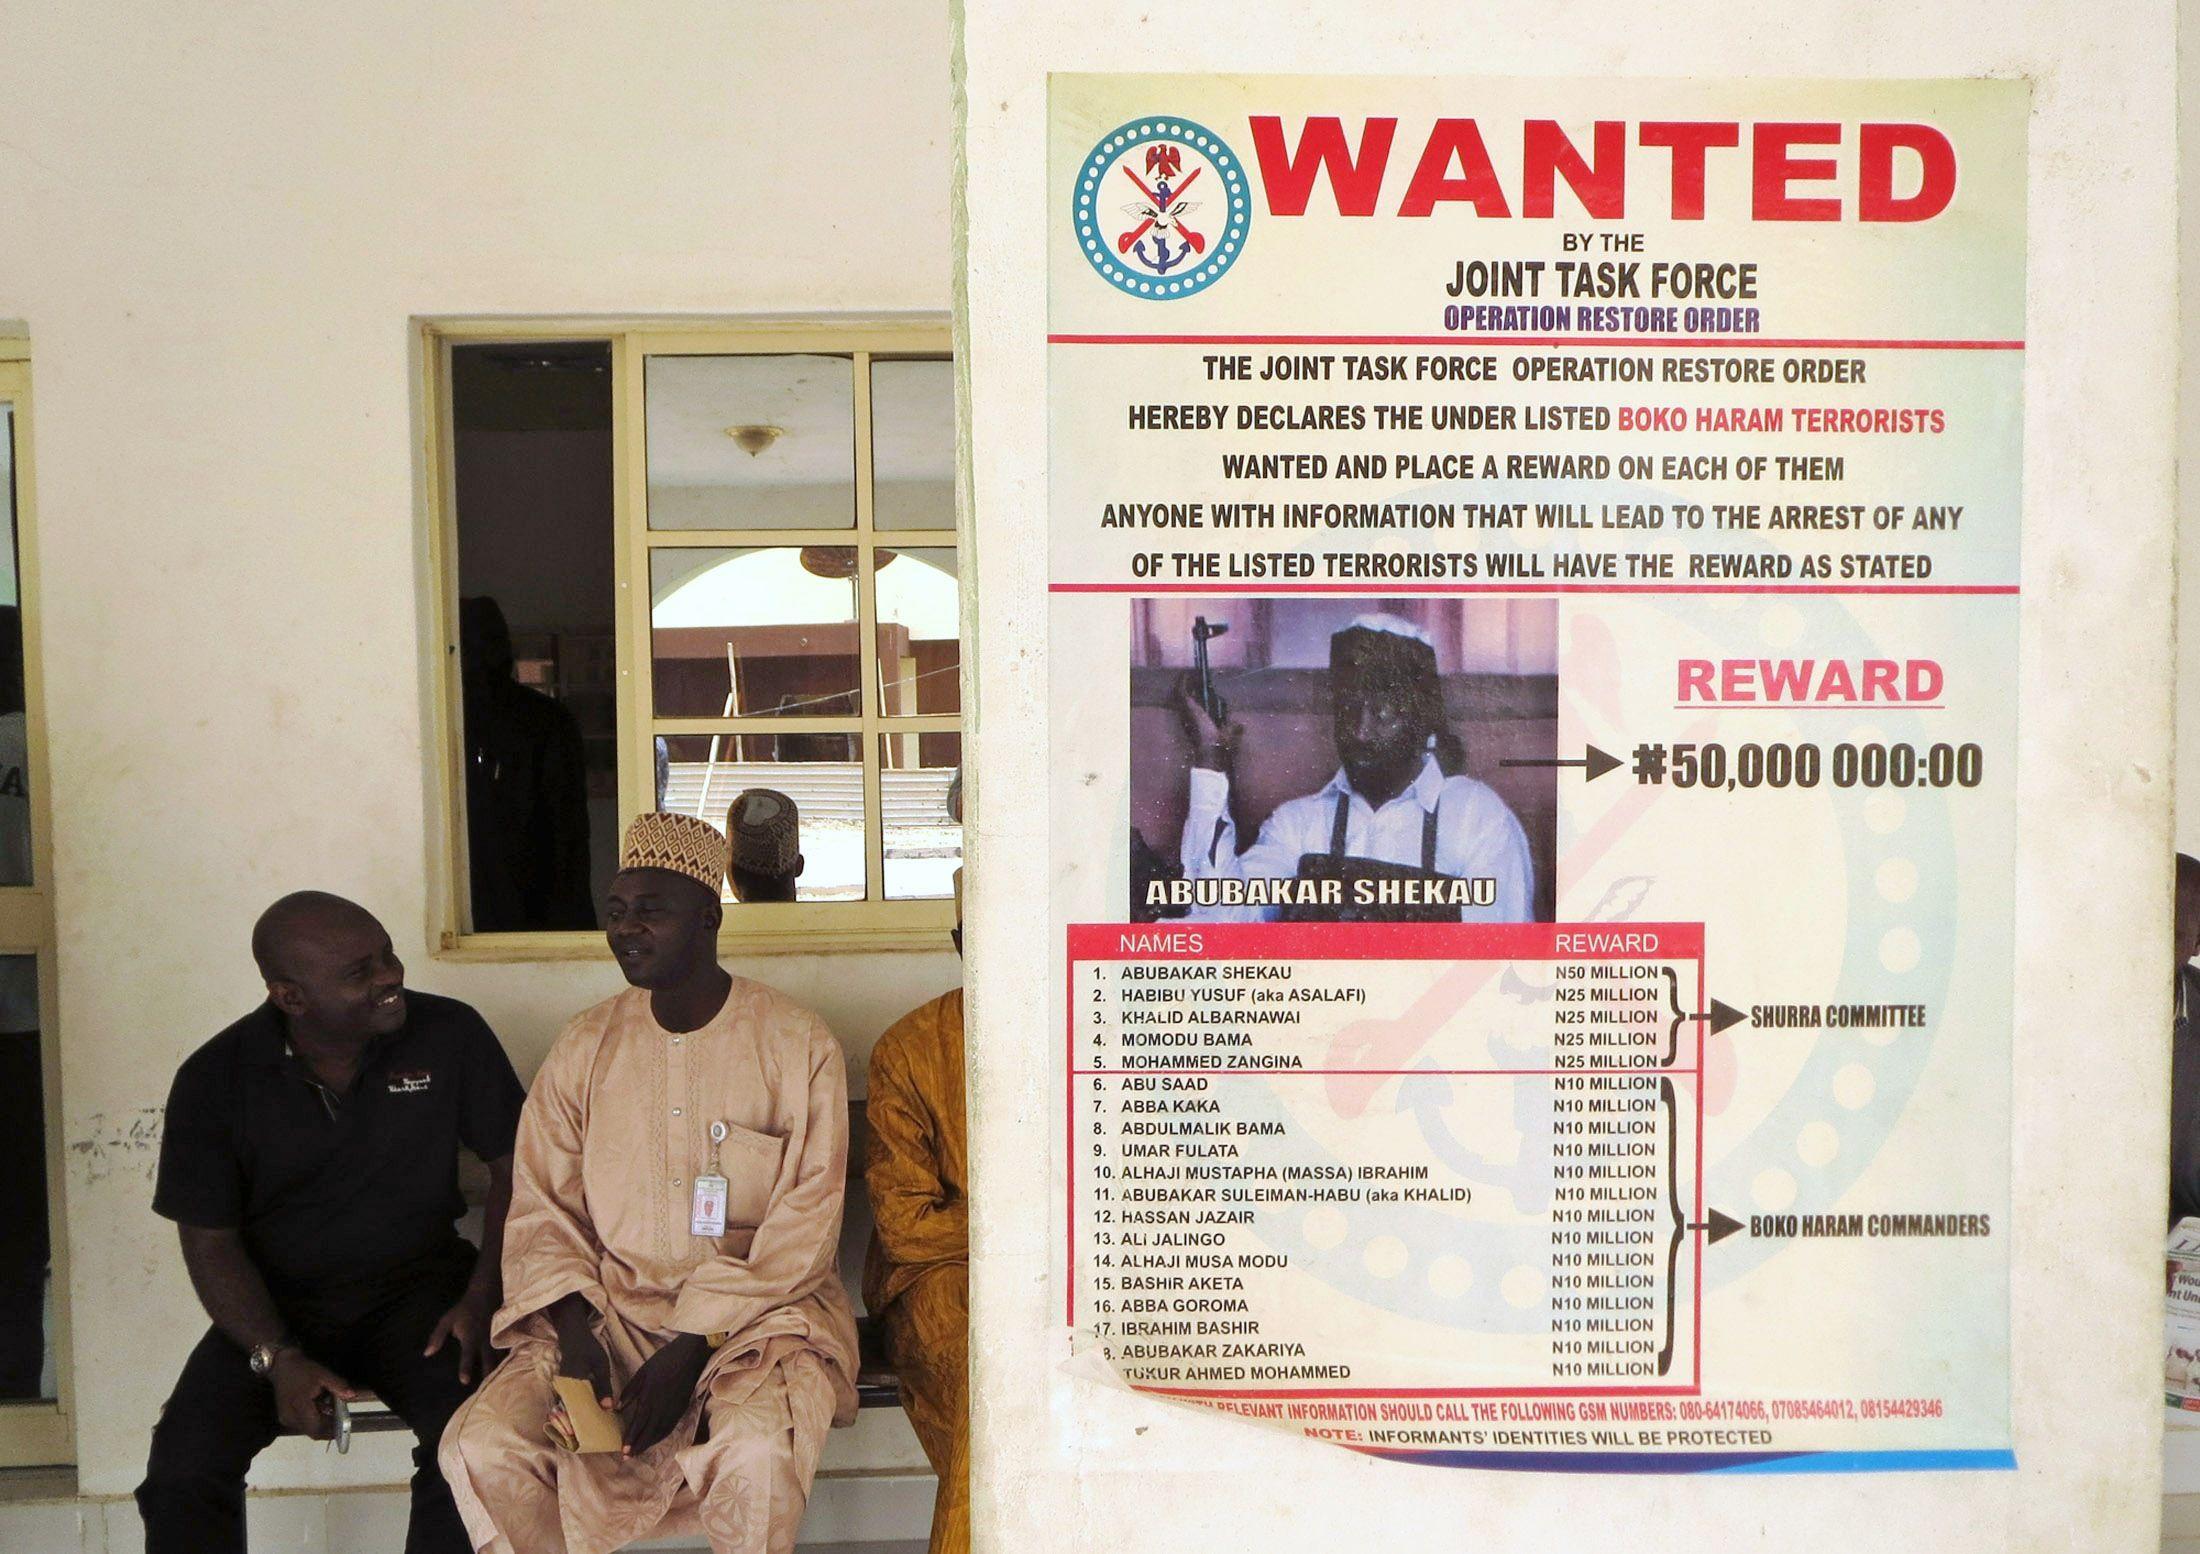 2014-07-01T052820Z_1_LYNXMPEA60167_RTROPTP_4_USA-NIGERIA-BOKOHARAM